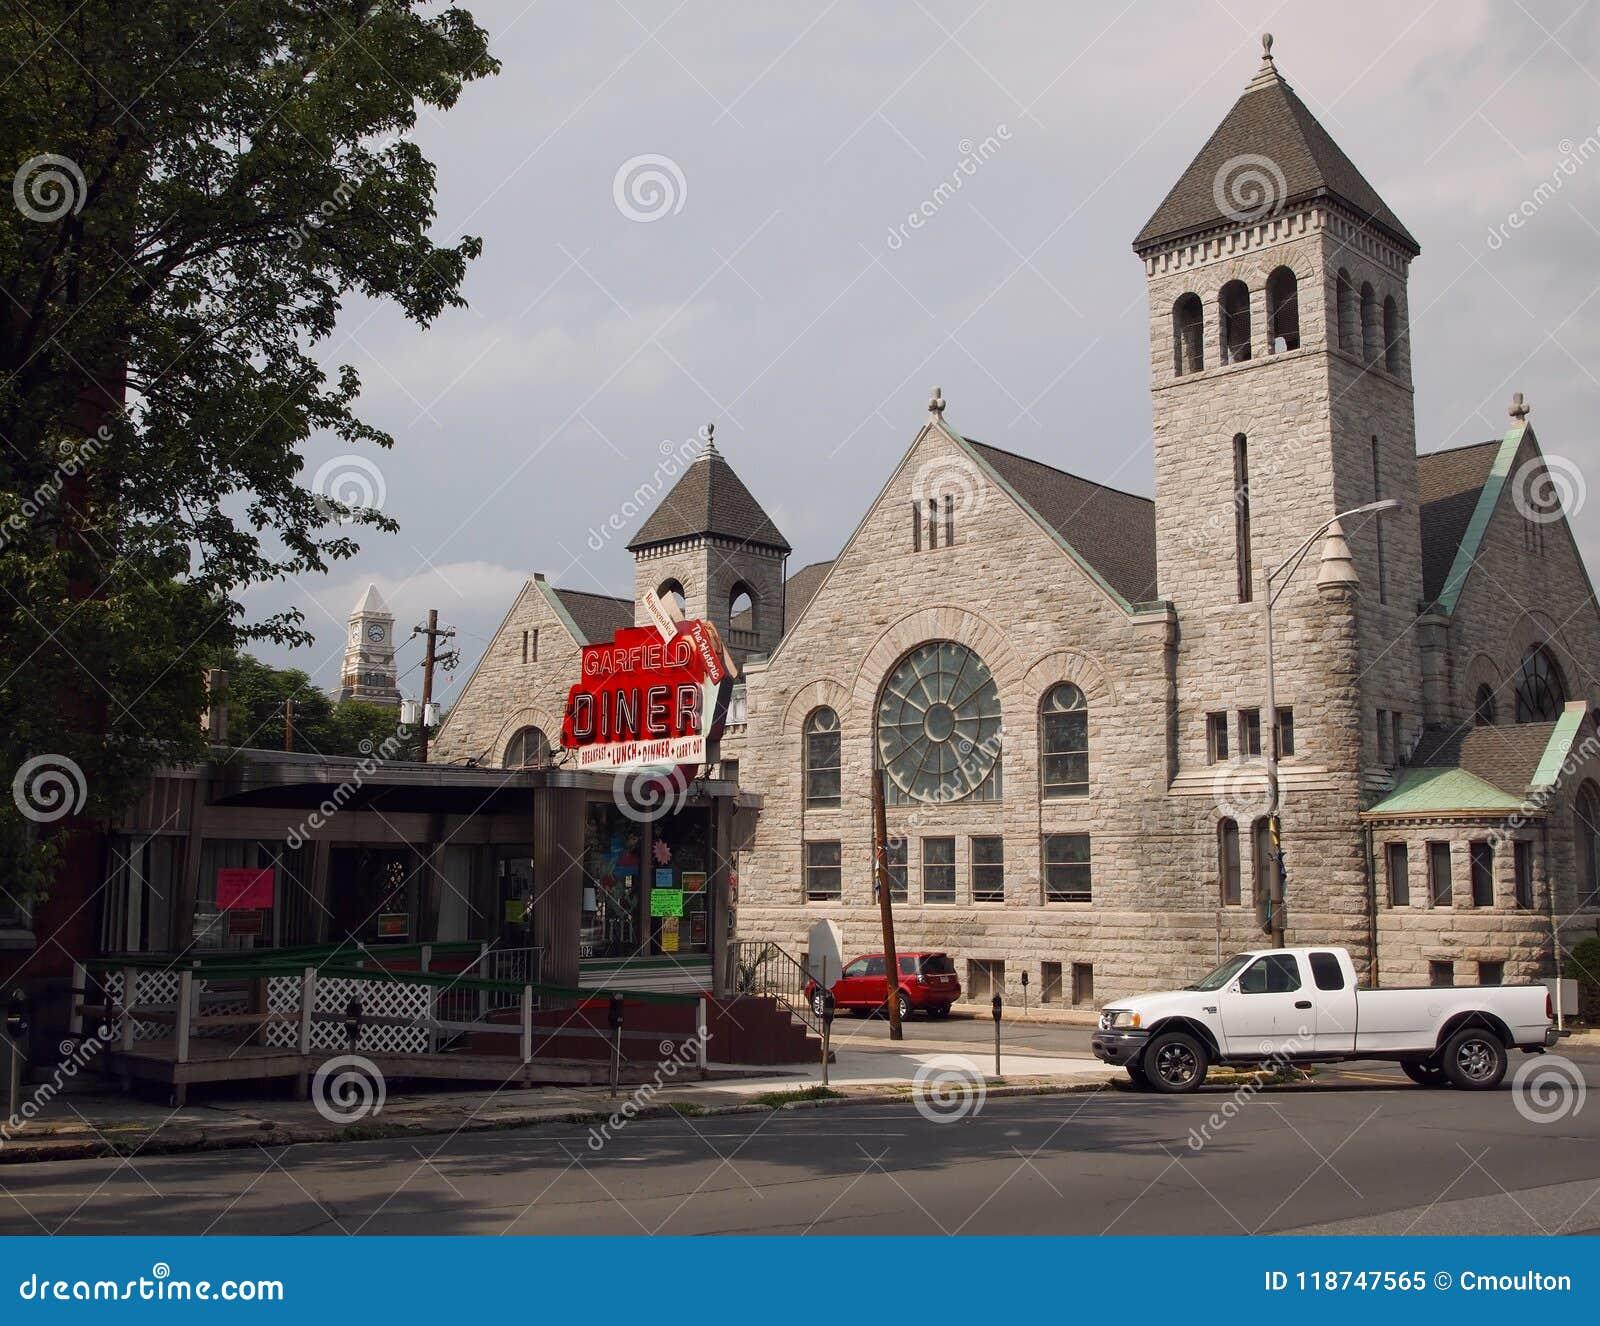 Garfield Diner On Garfield Square Pottsville Pensilvânia